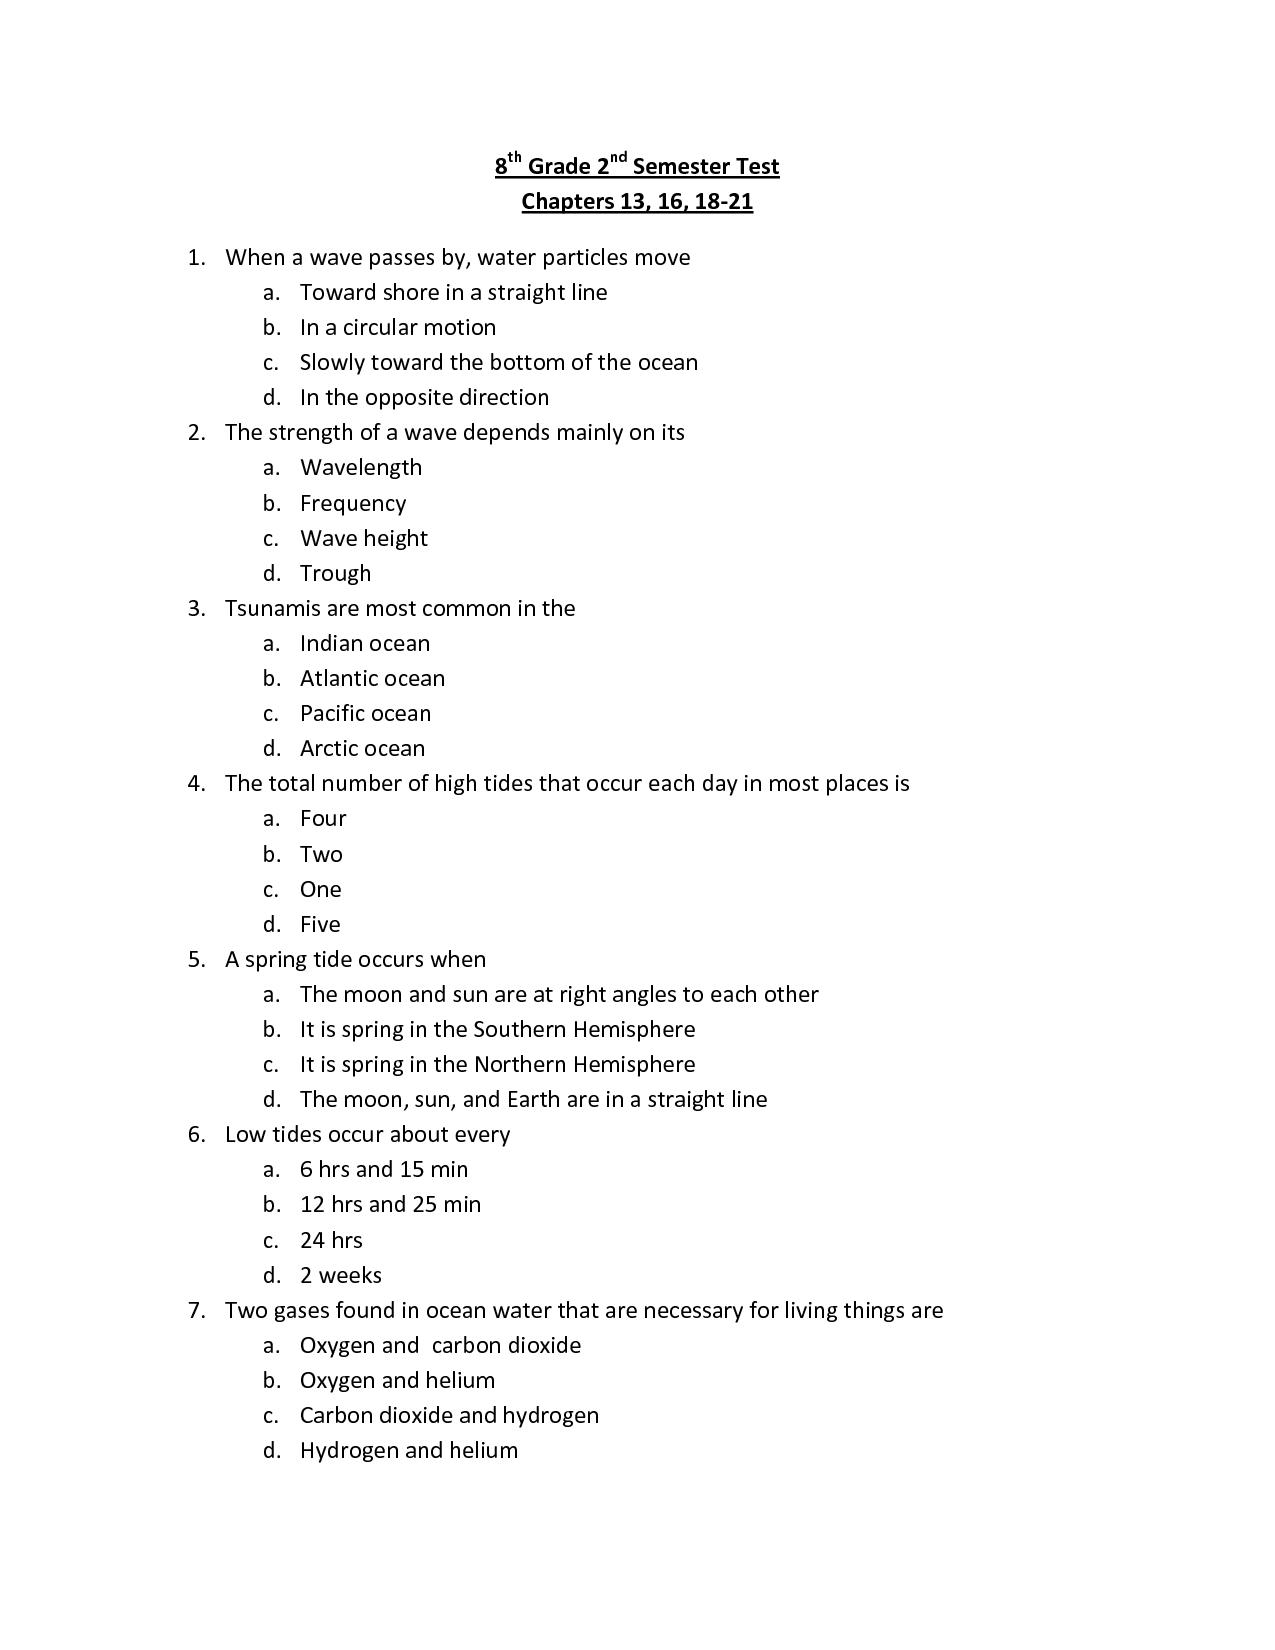 32 8th Grade History Worksheet